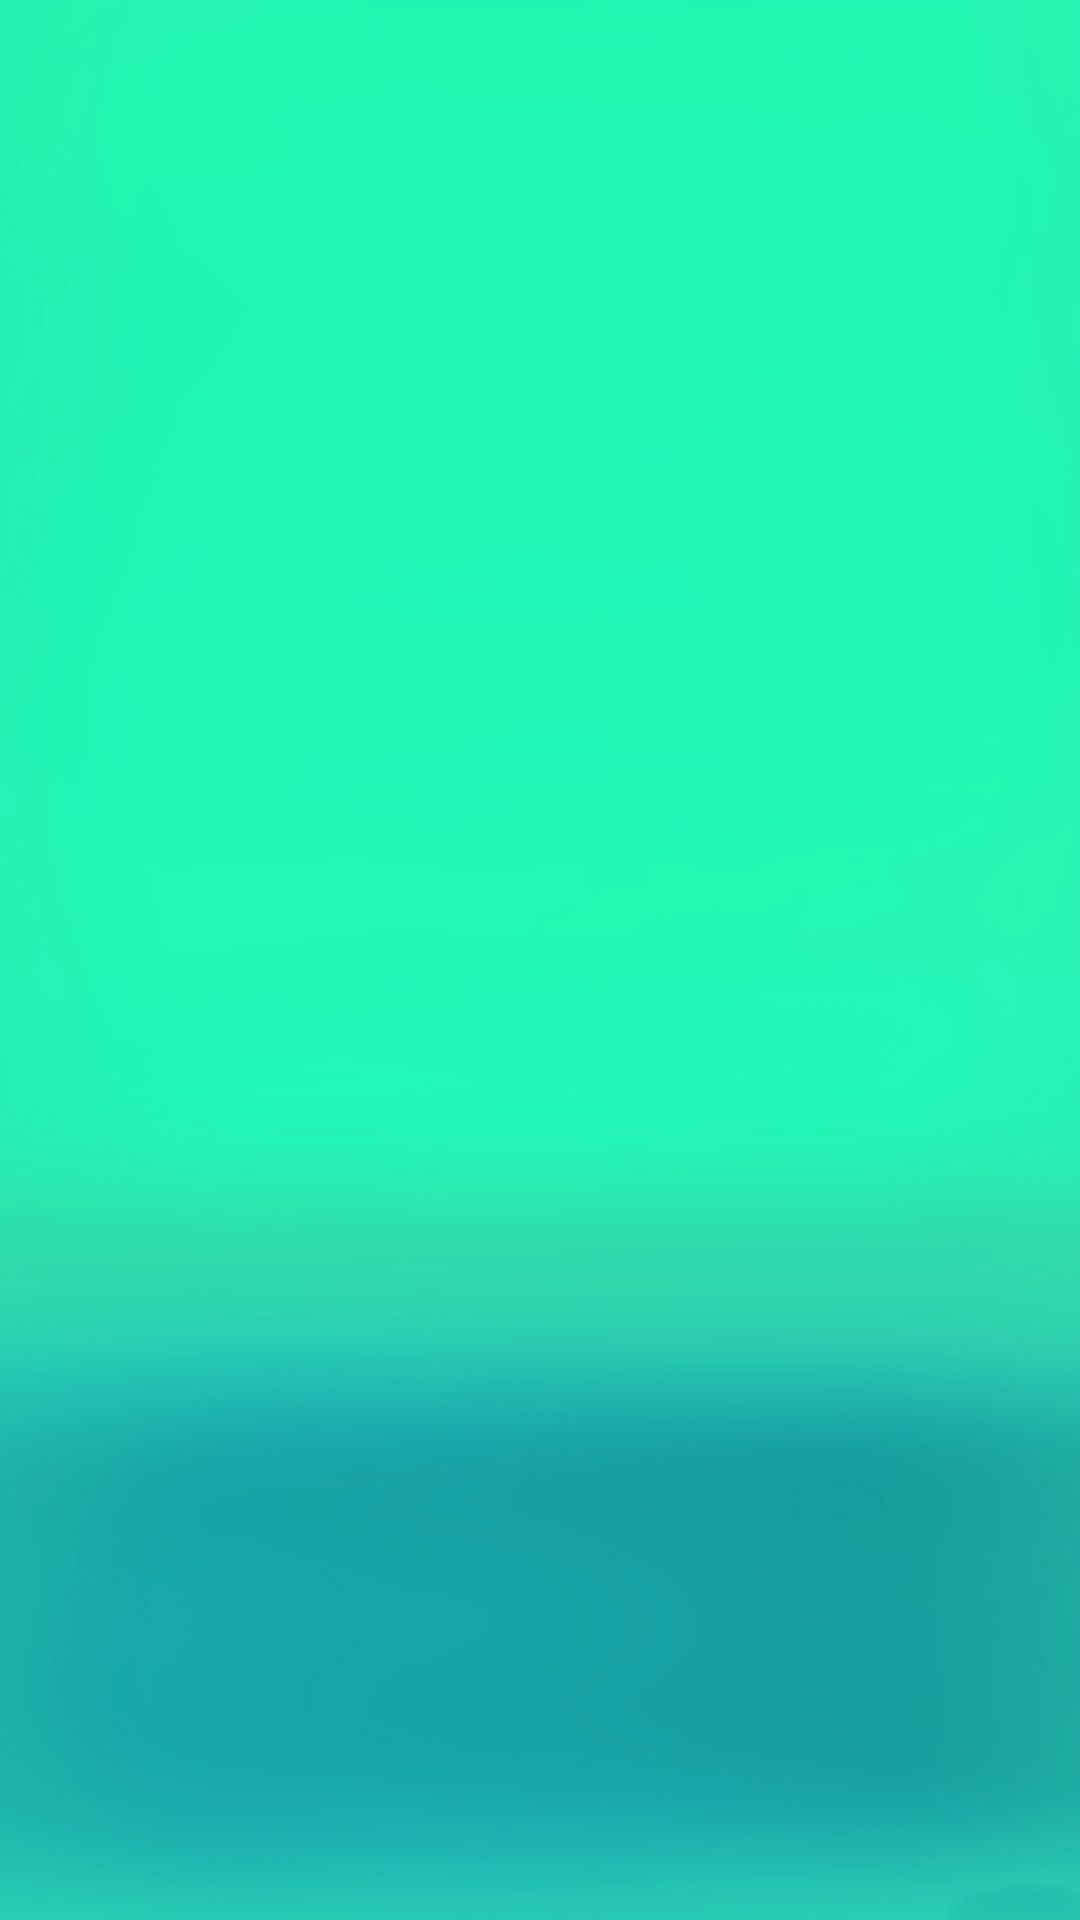 Wallpaper iphone green - Green Blue Rothko Gradation Blur Iphone 6 Wallpaper